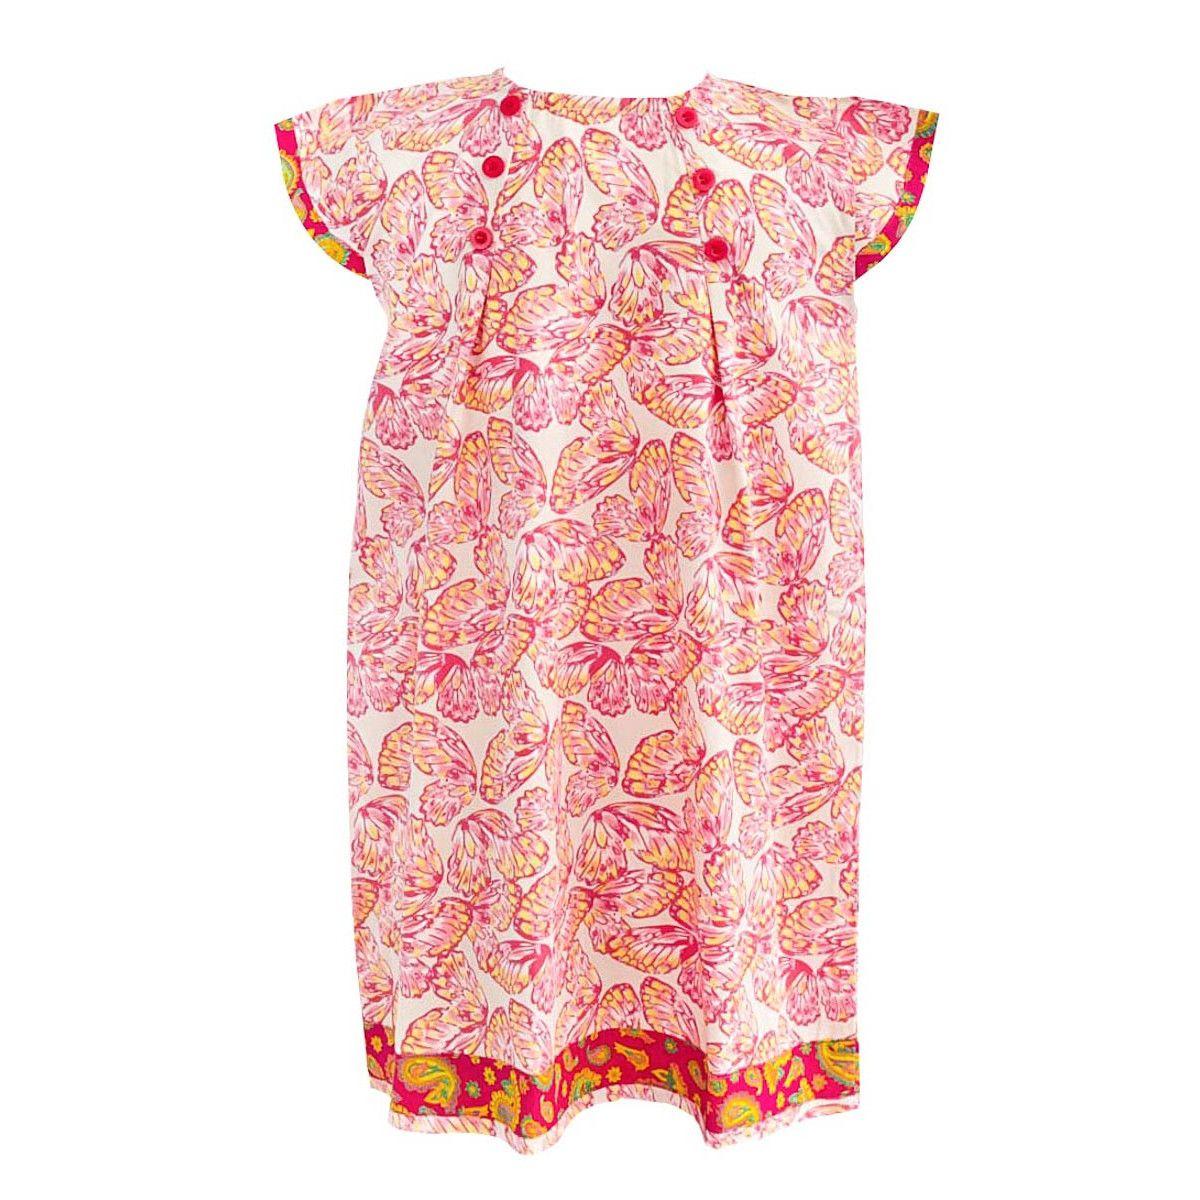 Robe manches courtes coton fille motif papillon